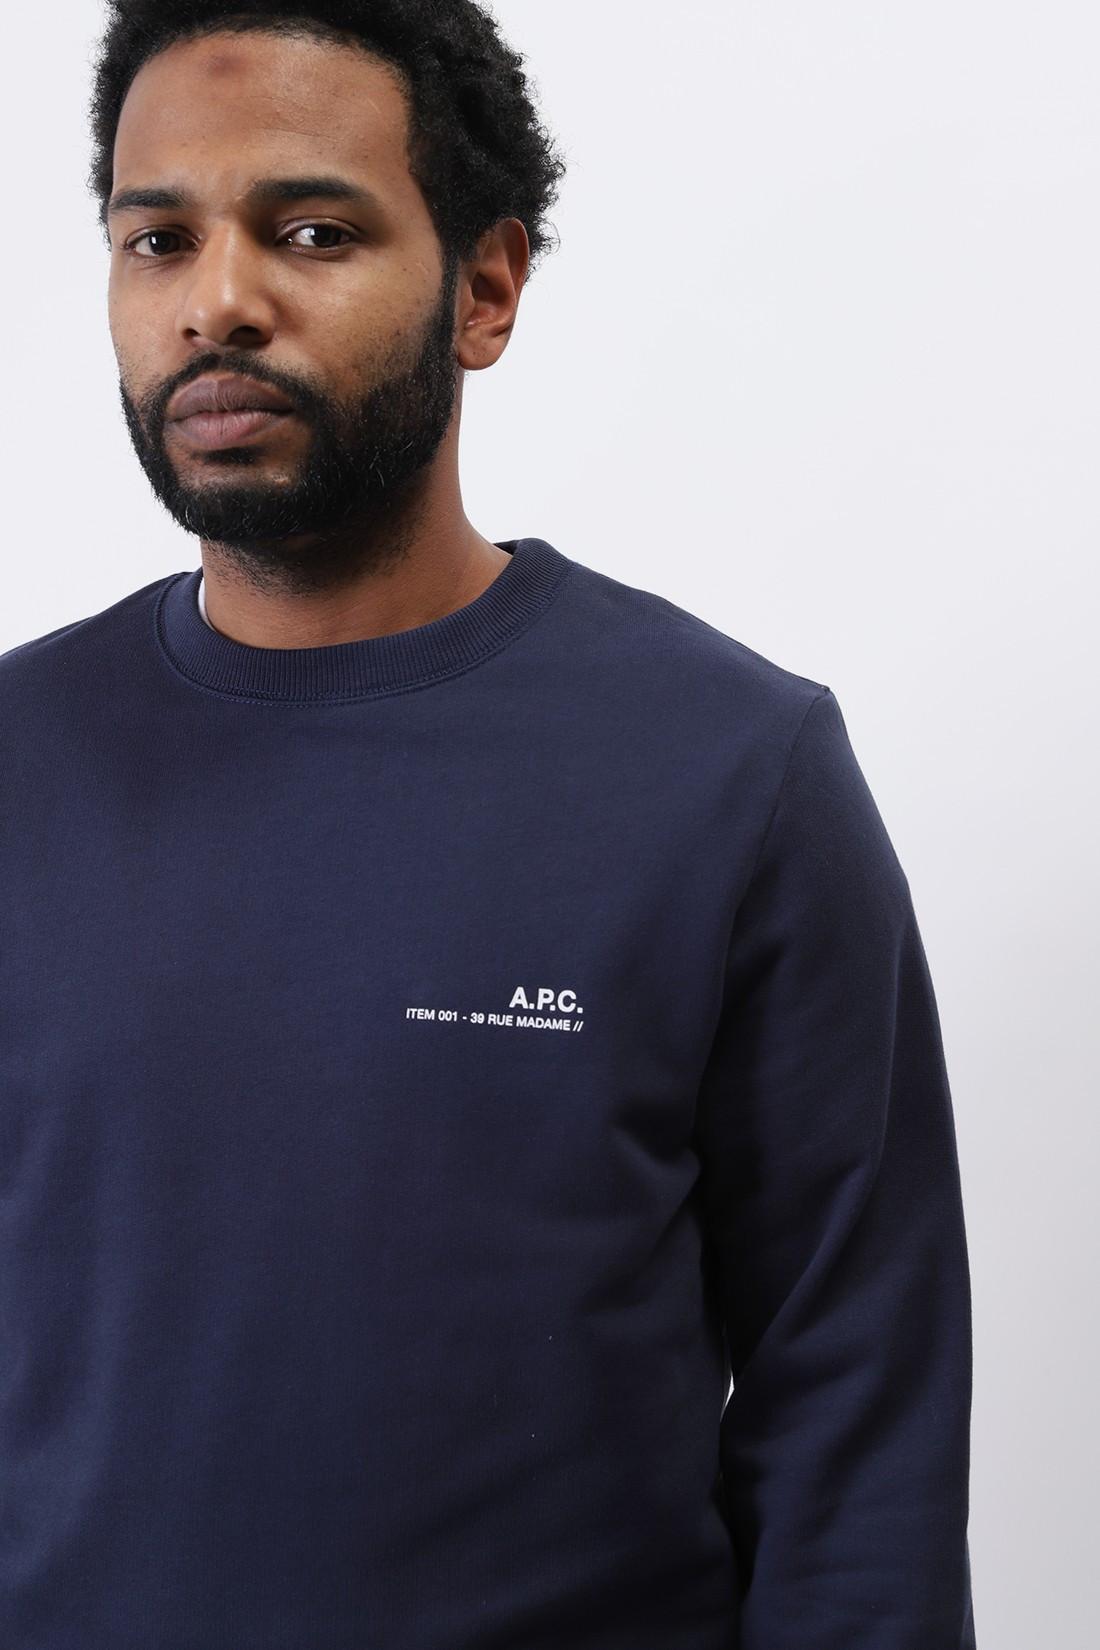 A.P.C. / Sweat item Dark navy